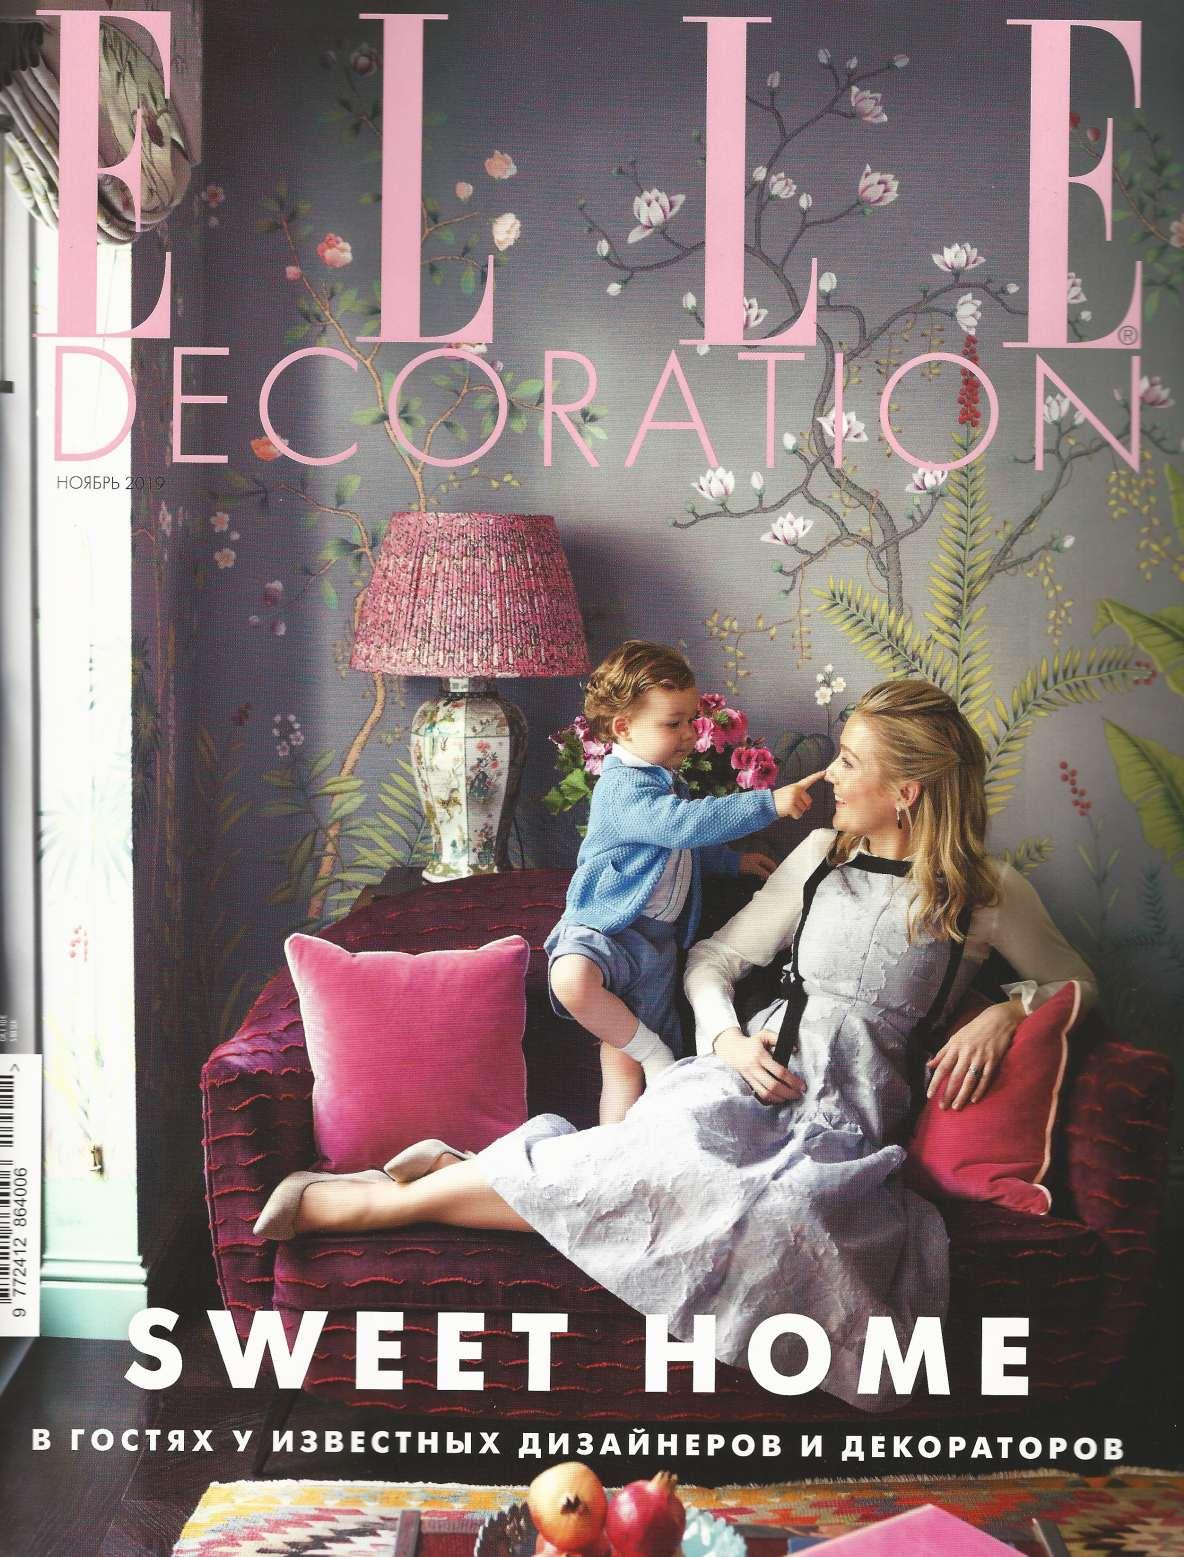 ELLE DECORATION SWEET HOME